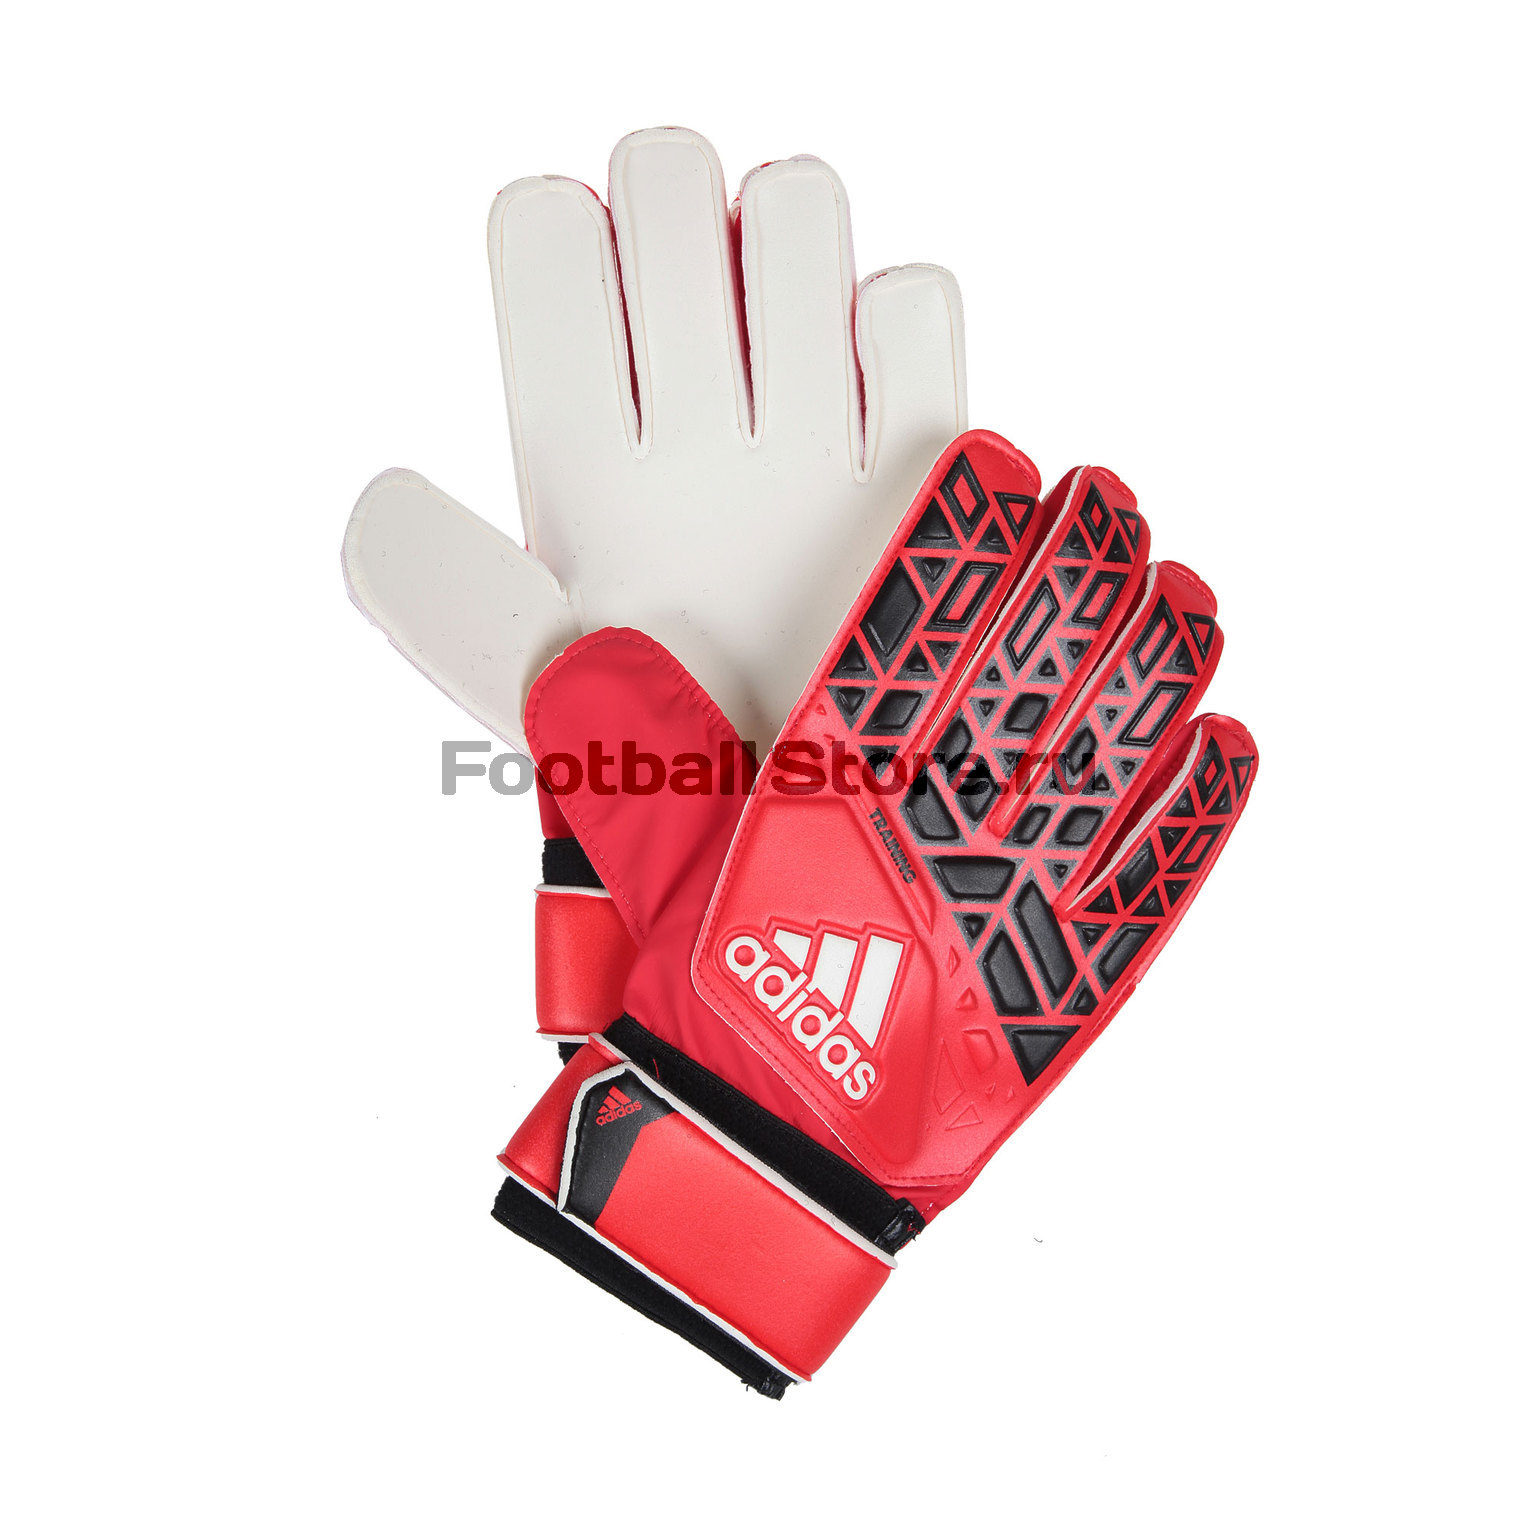 Перчатки вратарские Adidas Ace Training AZ3683 перчатки вратарские adidas ace half neg az3688